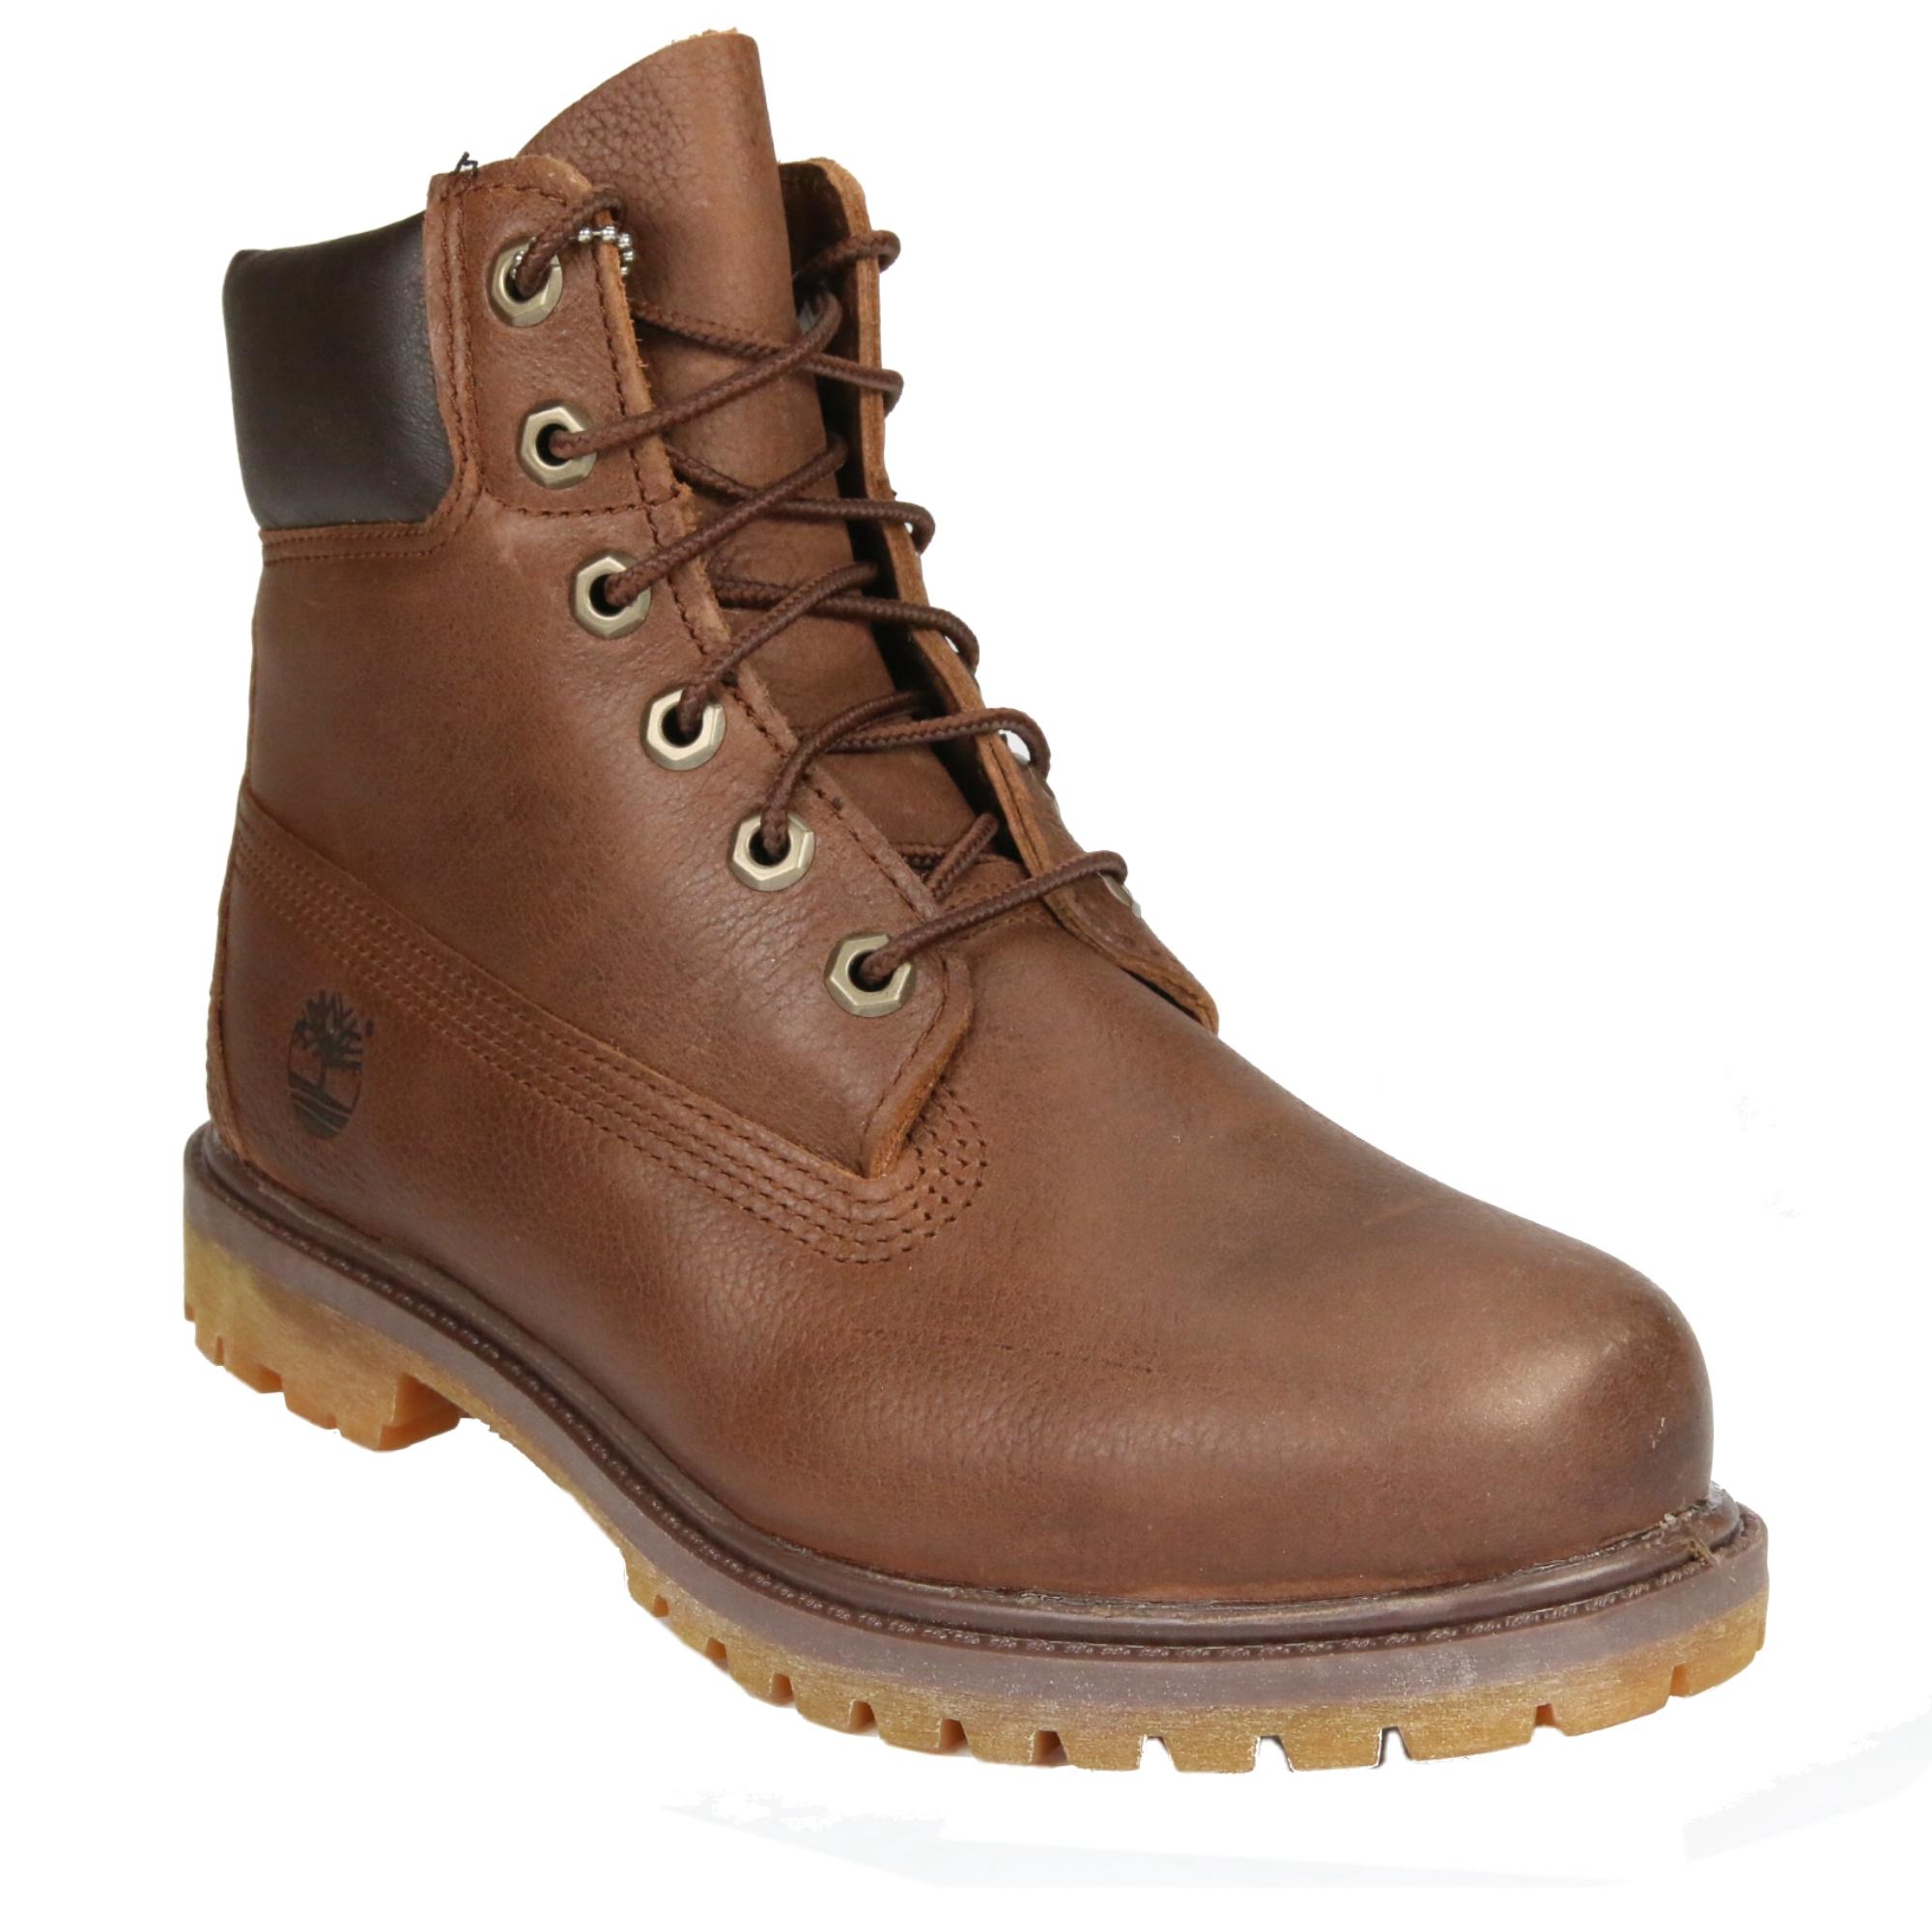 Timberland 6-Inch Premium Boots Damen Schuhe Stiefel ...